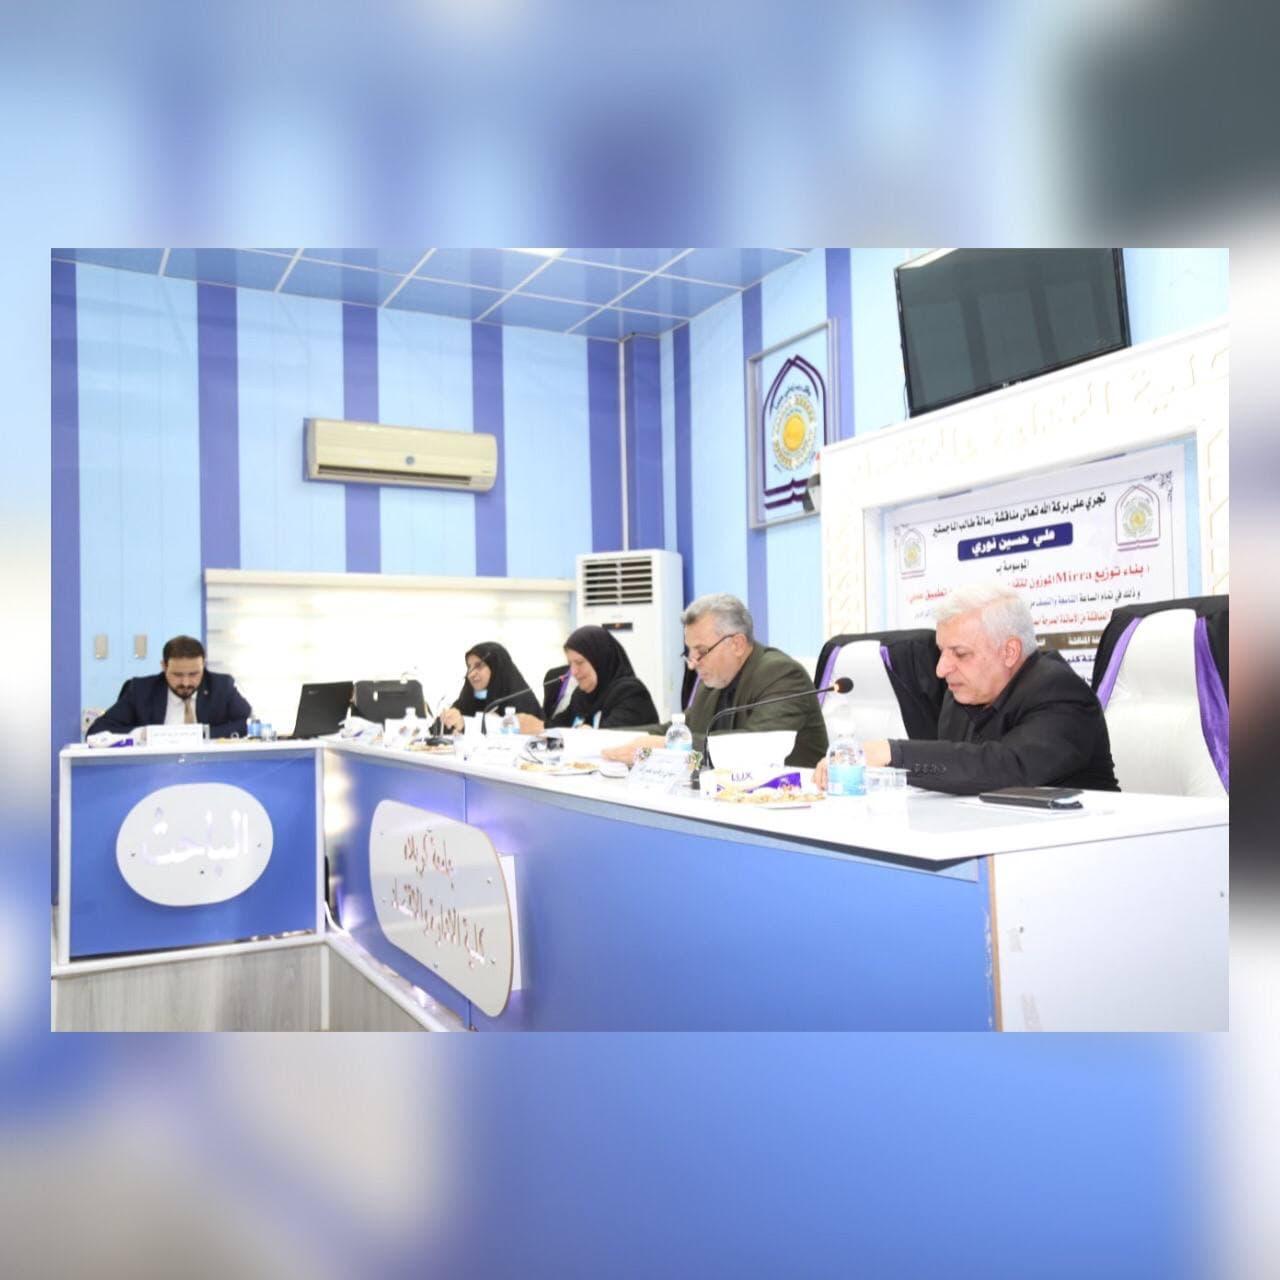 Read more about the article رسالة ماجستير في جامعة كربلاء تناقش بناء توزيع (Mirra) الموزون لتقدير دالة المعولية